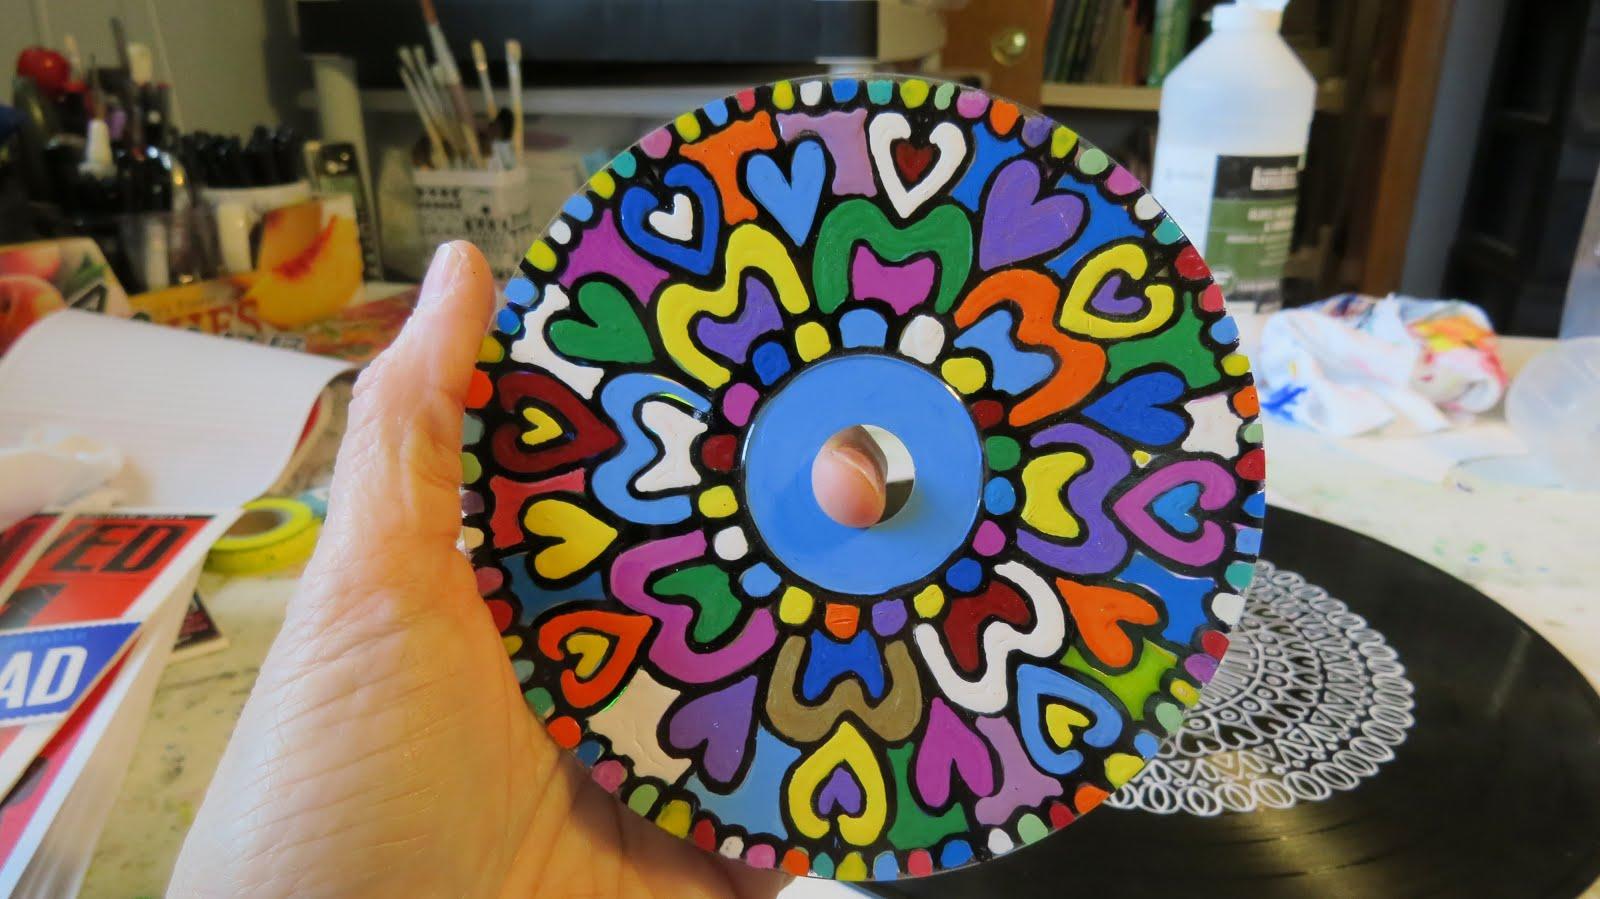 Doodled CD .. COOL